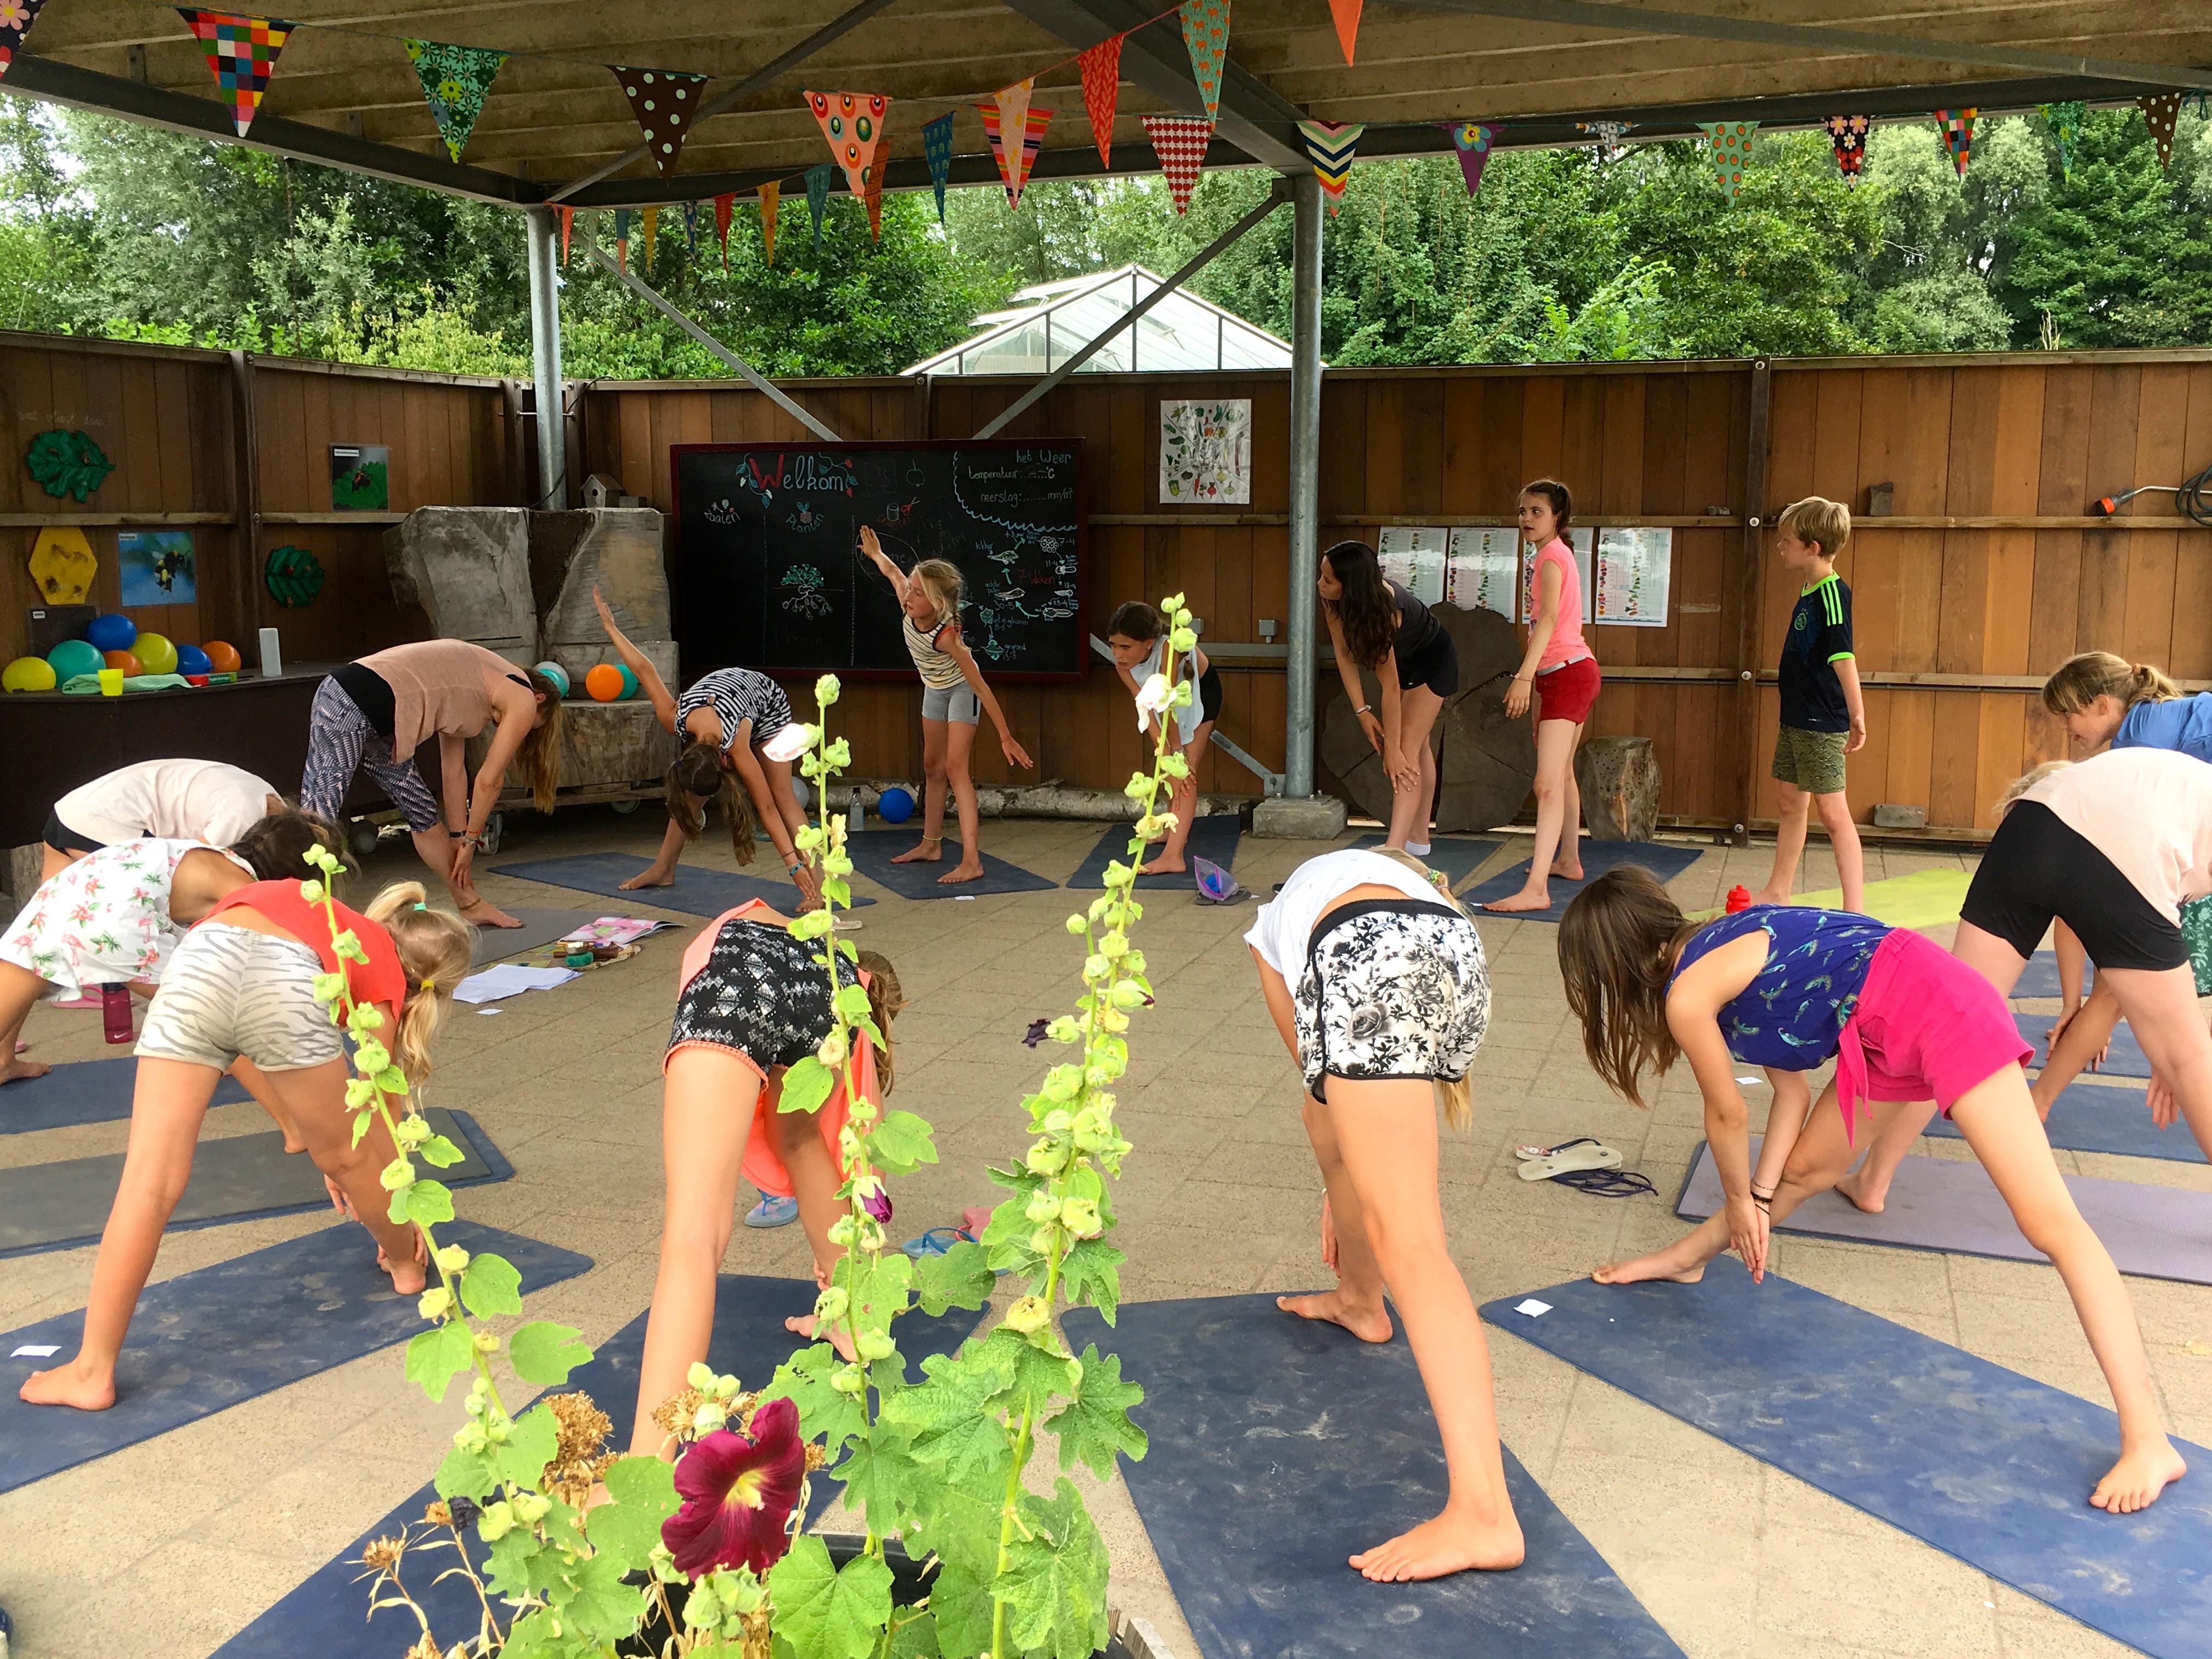 Yogakamp zomerkamp de Kinderyogatuin Aemstel schooltuin Amsterdam Amstelveen kinderyoga mindfulness meditatie buitenyoga